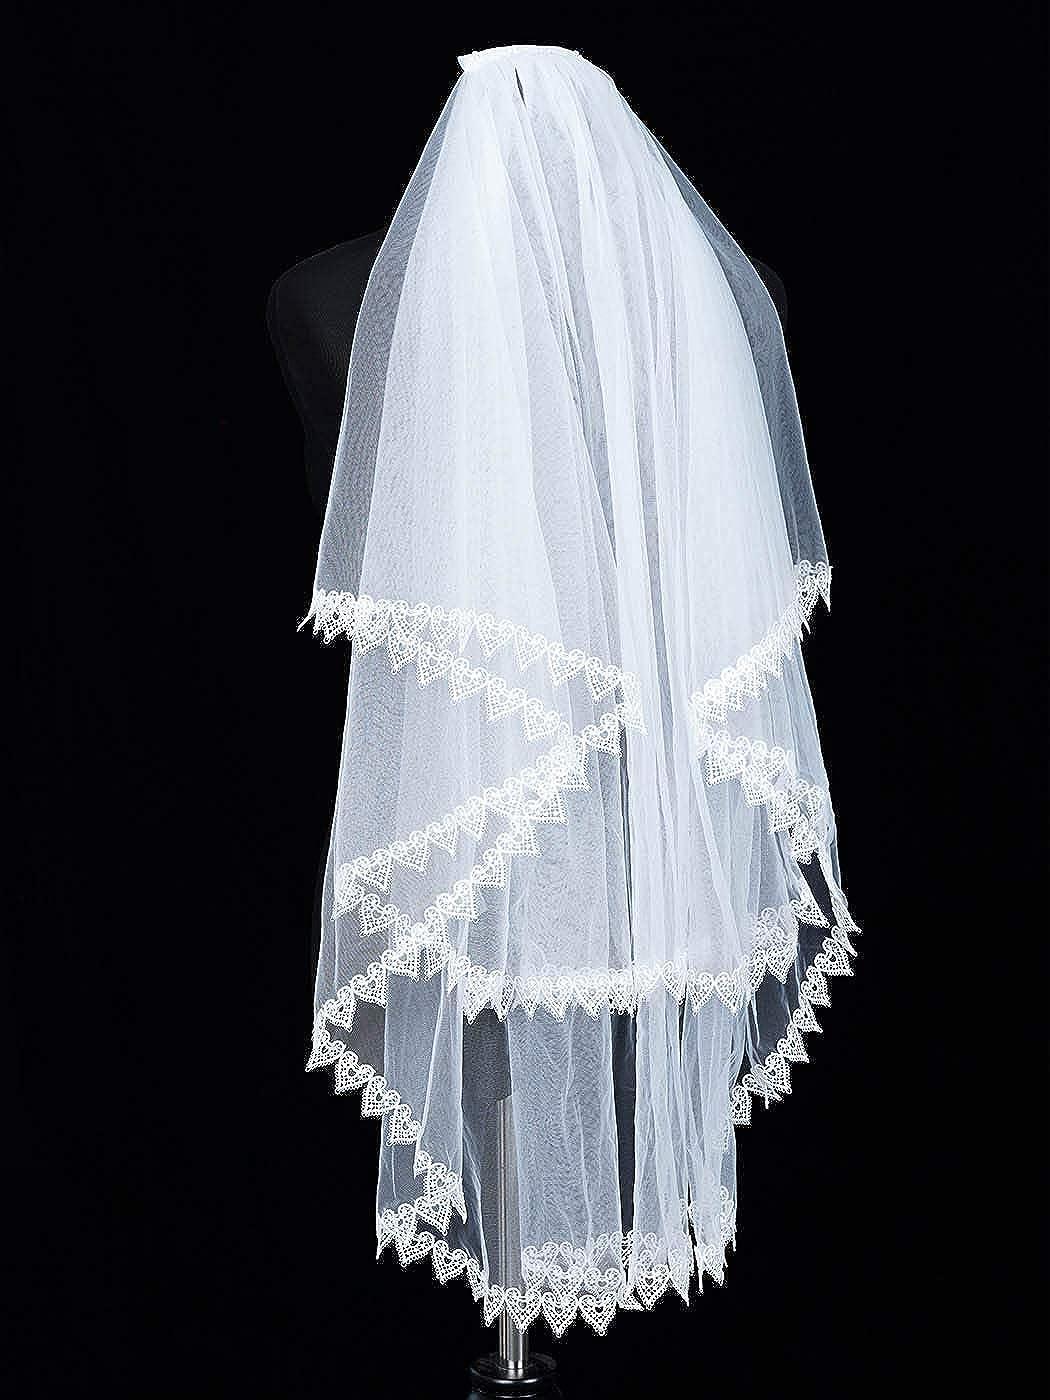 Aunica Women's Wedding Bridal Veil 2 Tier Lace Applique Edge Bride Veils with Comb Fingertip Length Wedding Headpiece (White)